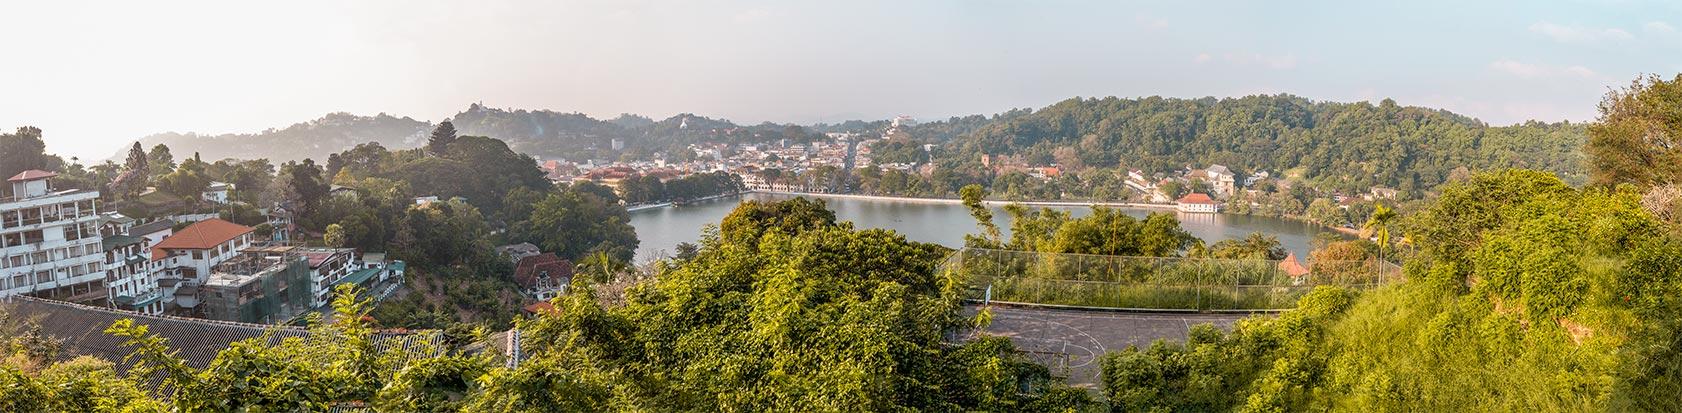 Panorama von Kandy in Sri Lanka